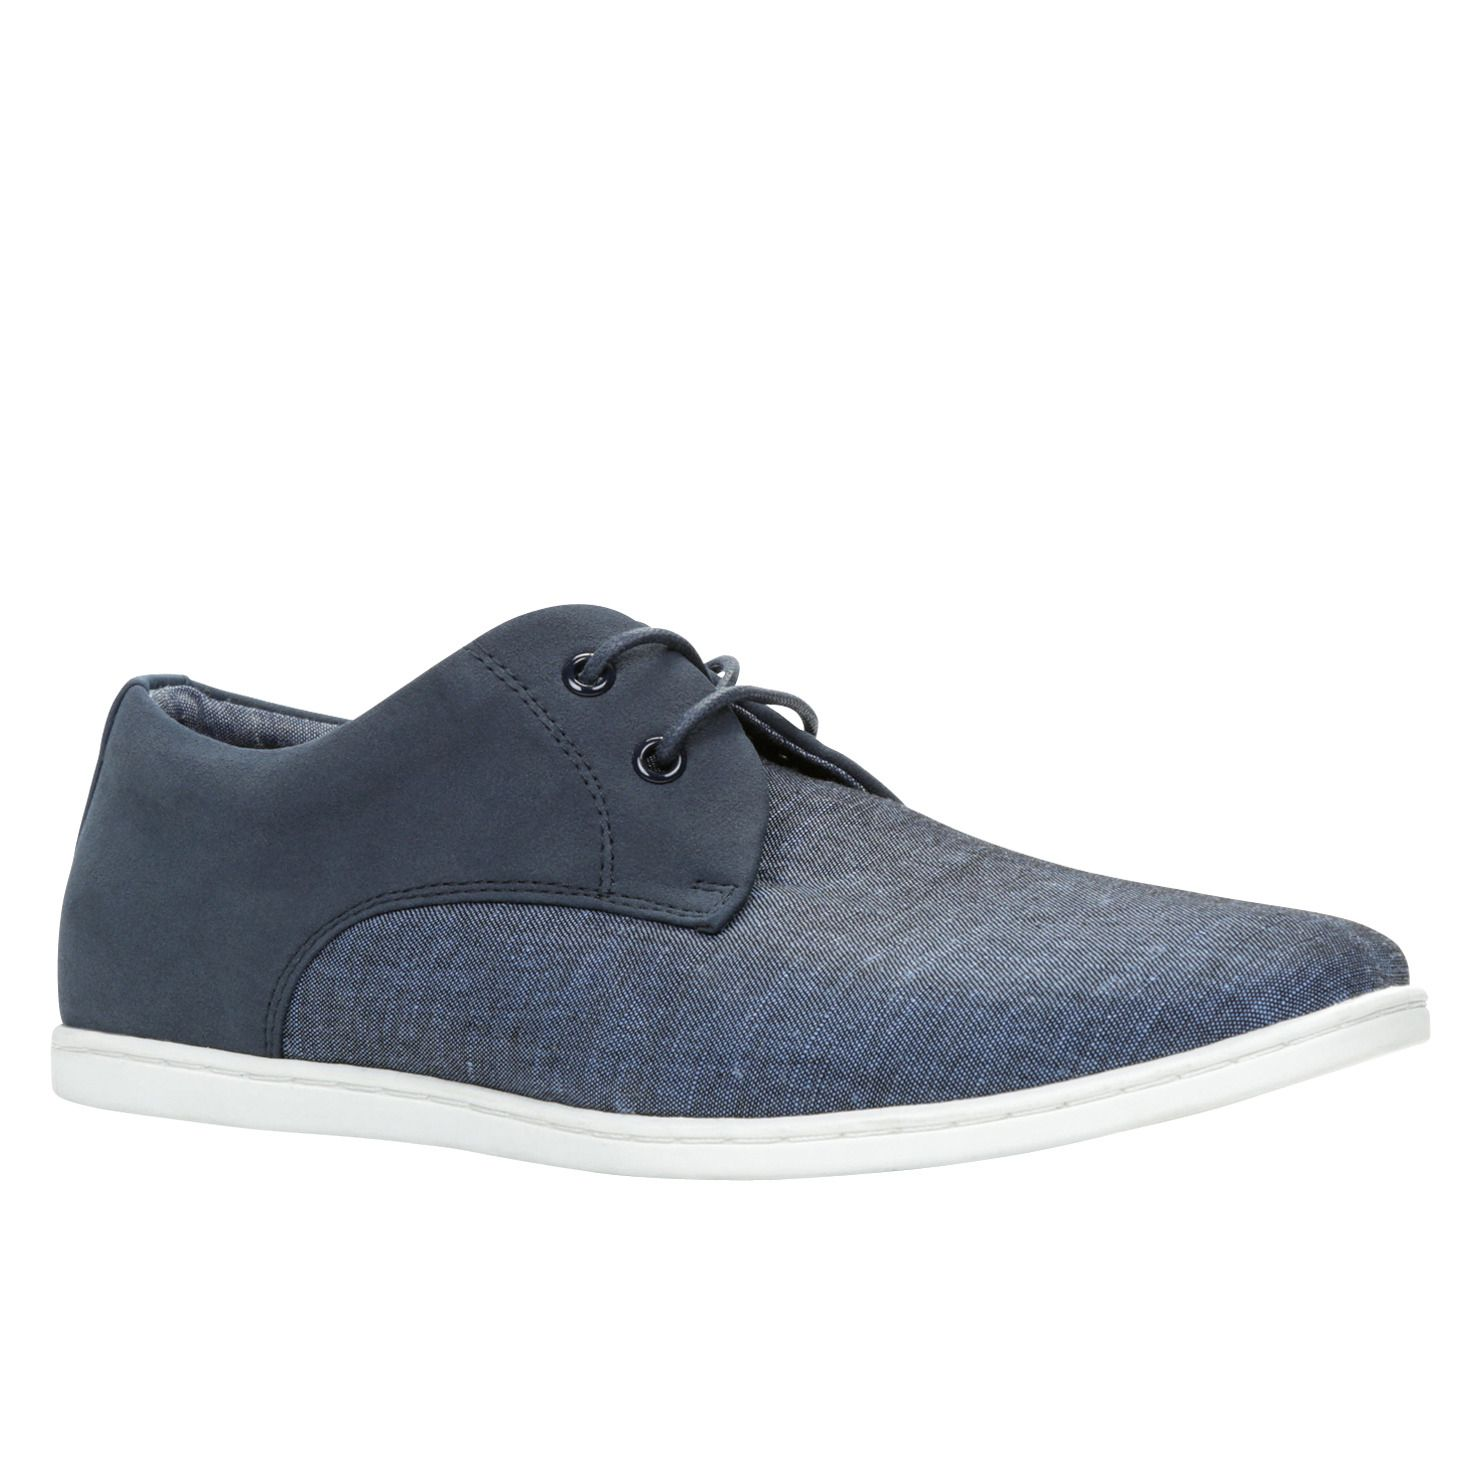 ALDO US | Shoes, Boots, Sandals, Handbags & Accessories